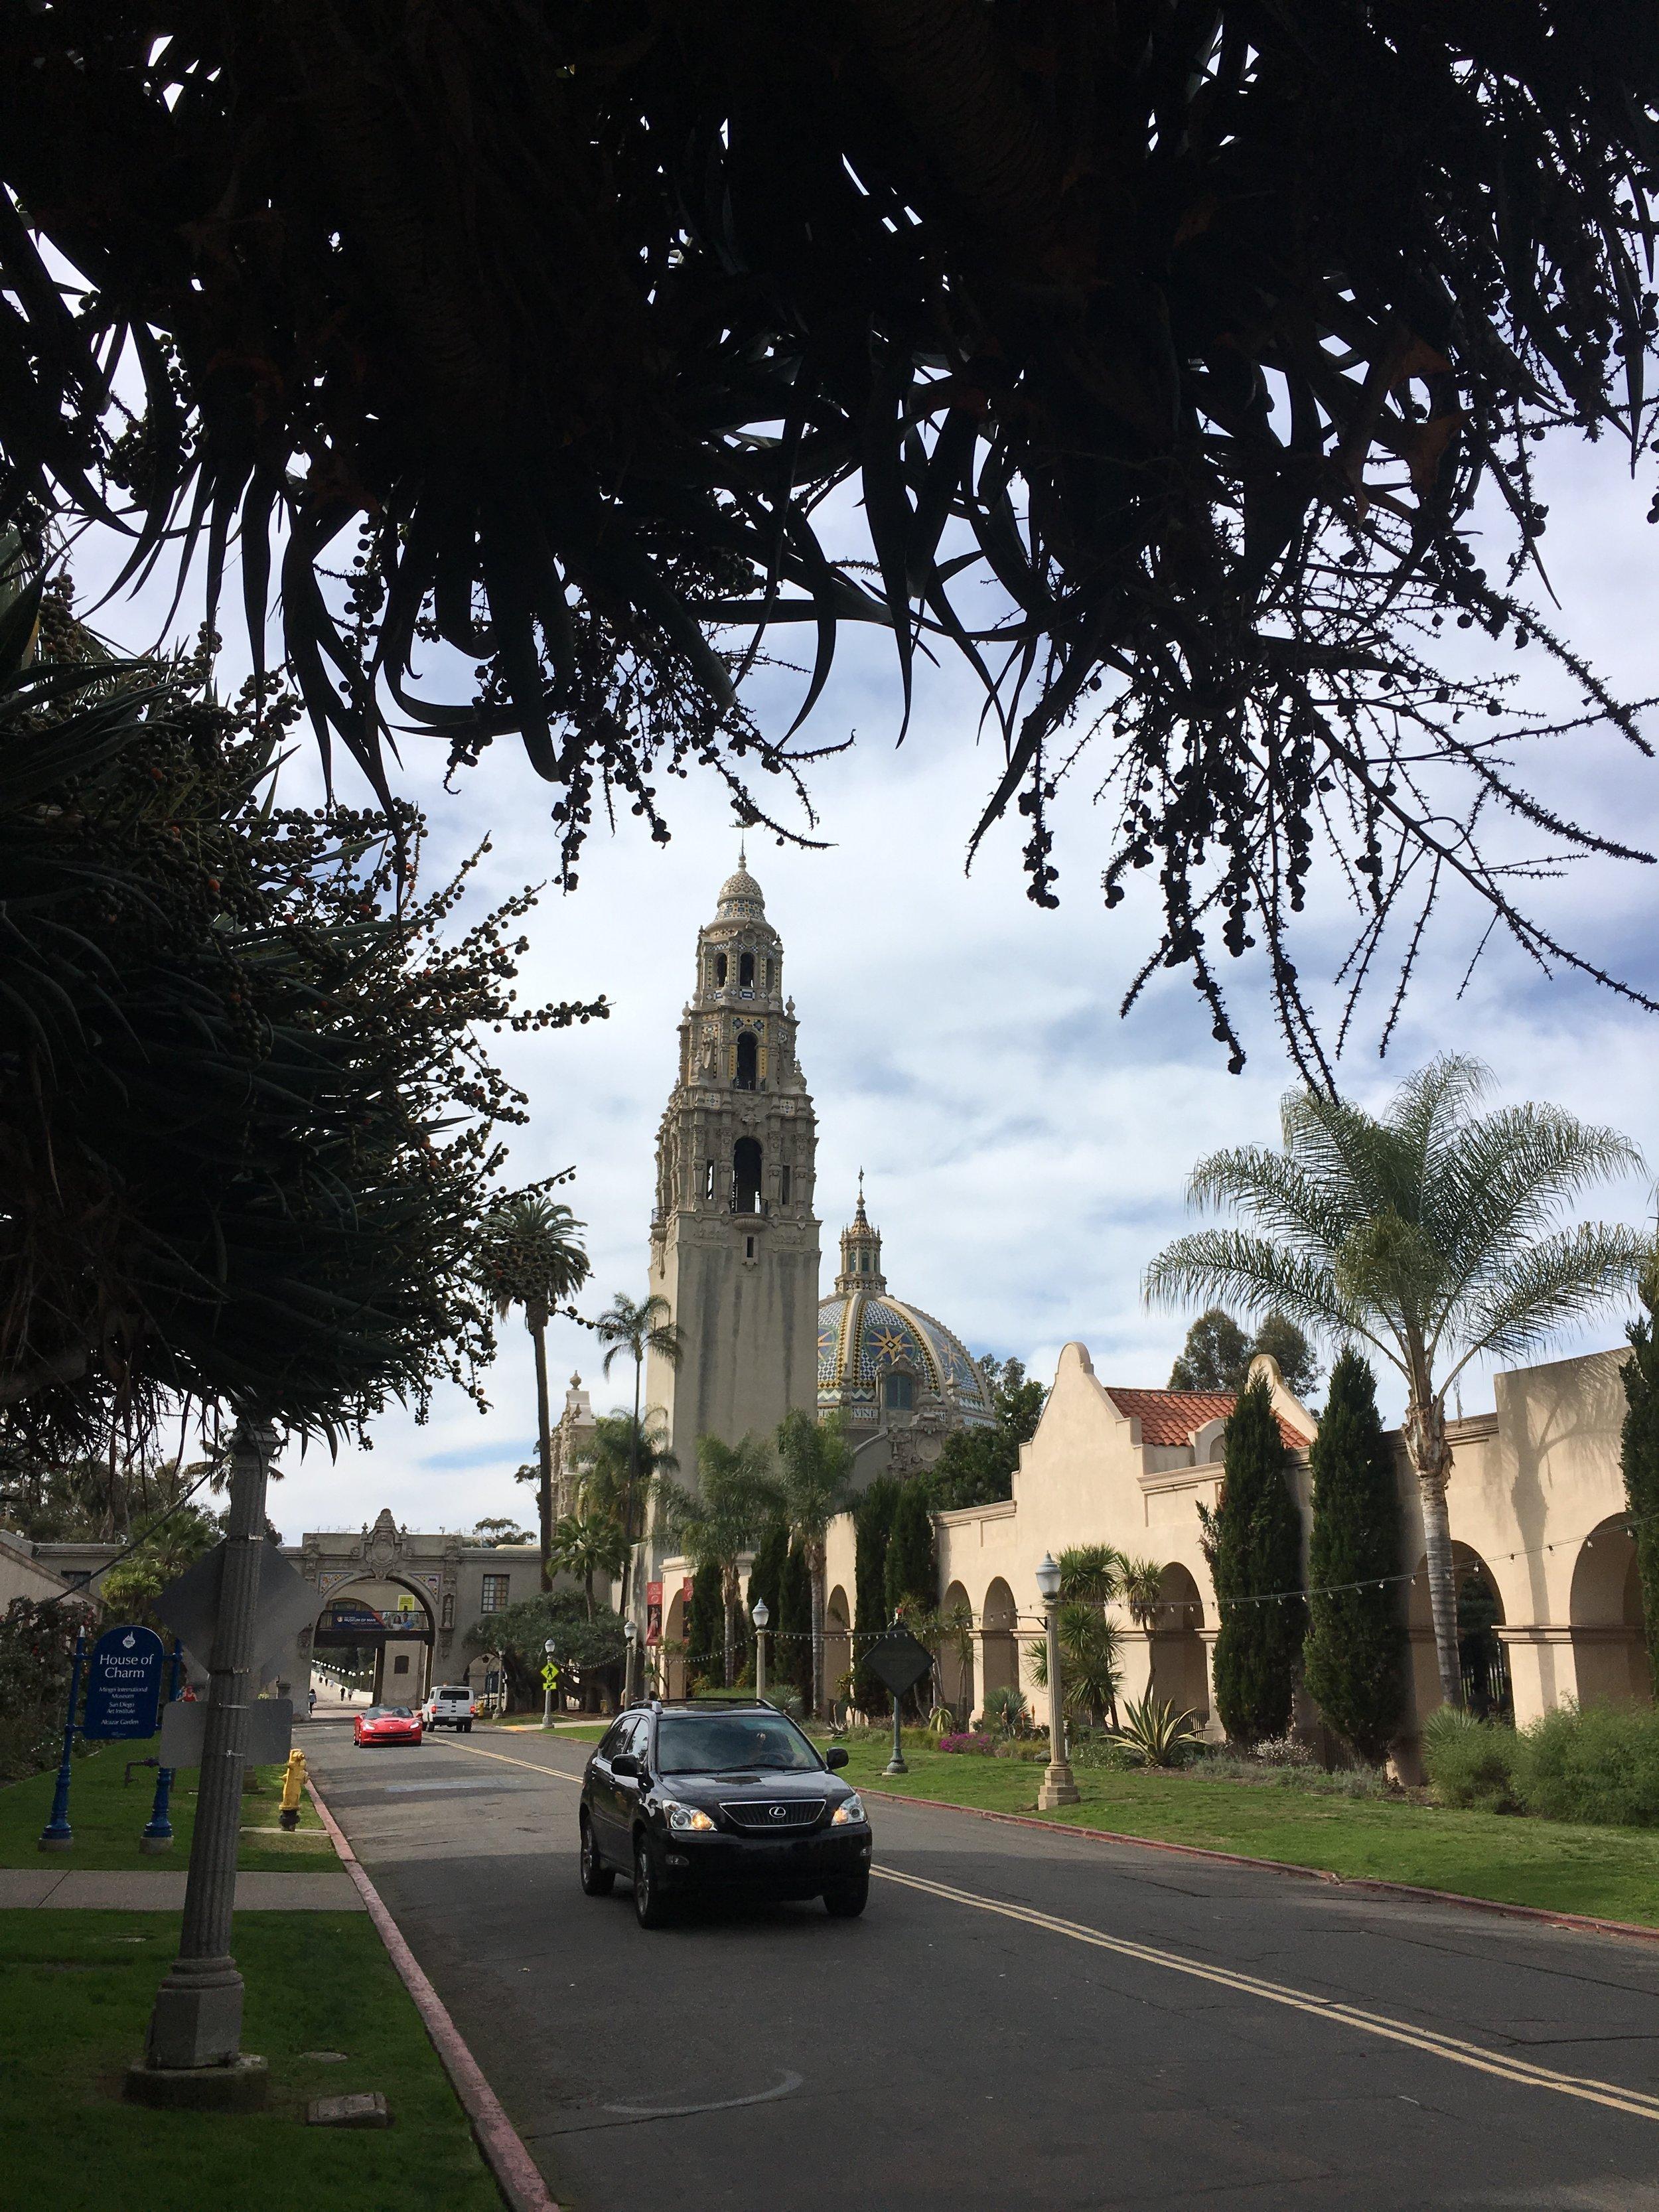 Balboa Park in San Diego, CA